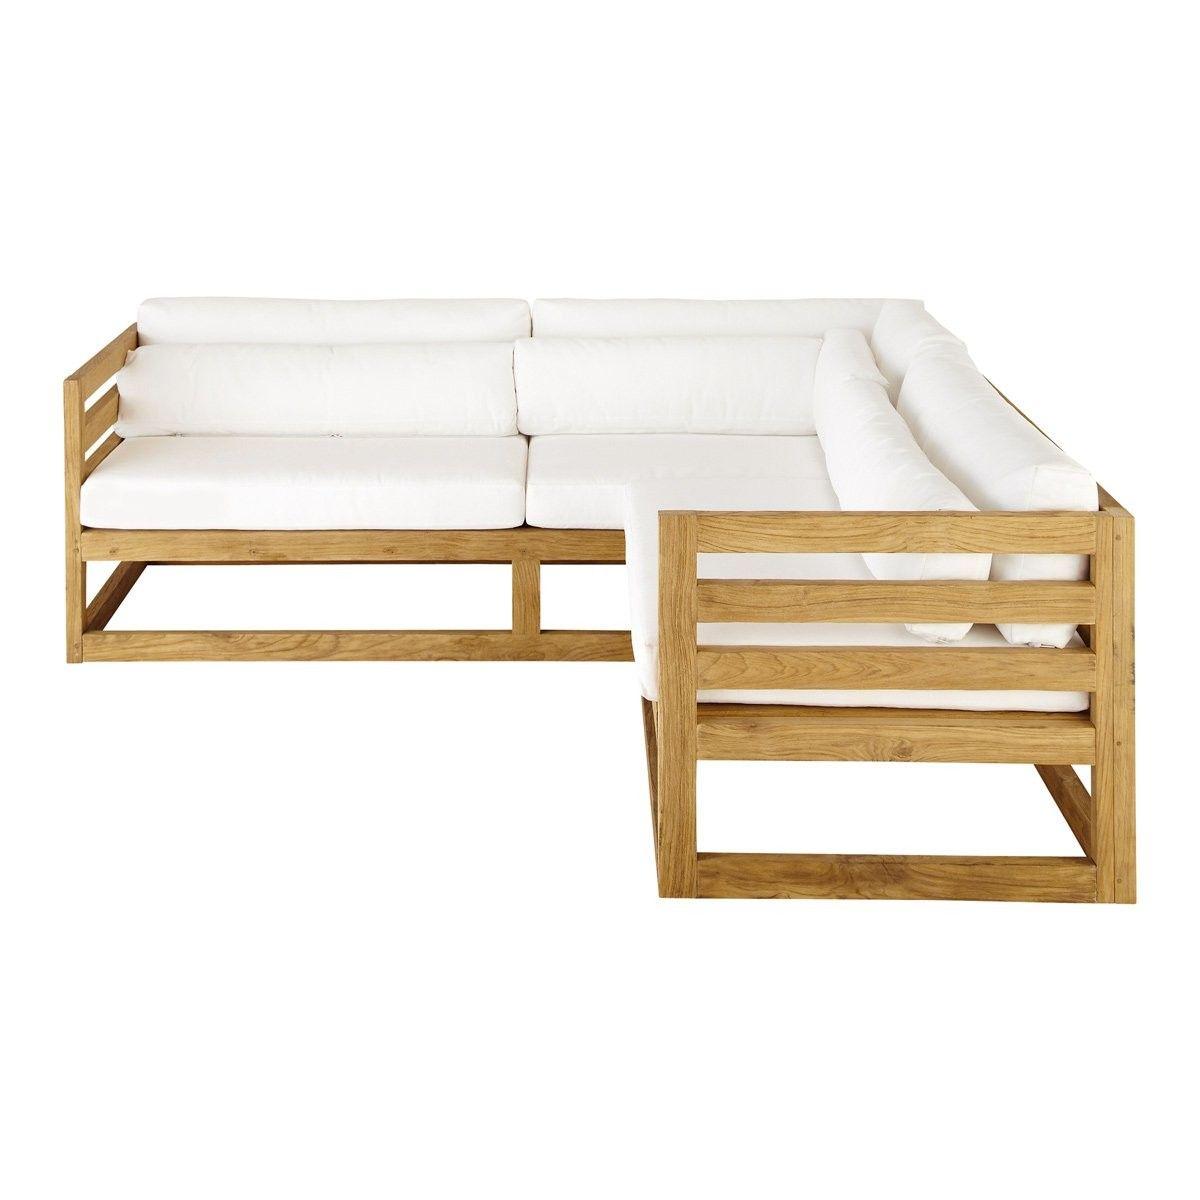 Simple Wooden Corner Sofa Sofa Set Designs Wood Sofa Latest Furniture Designs Corner Sofa Wooden